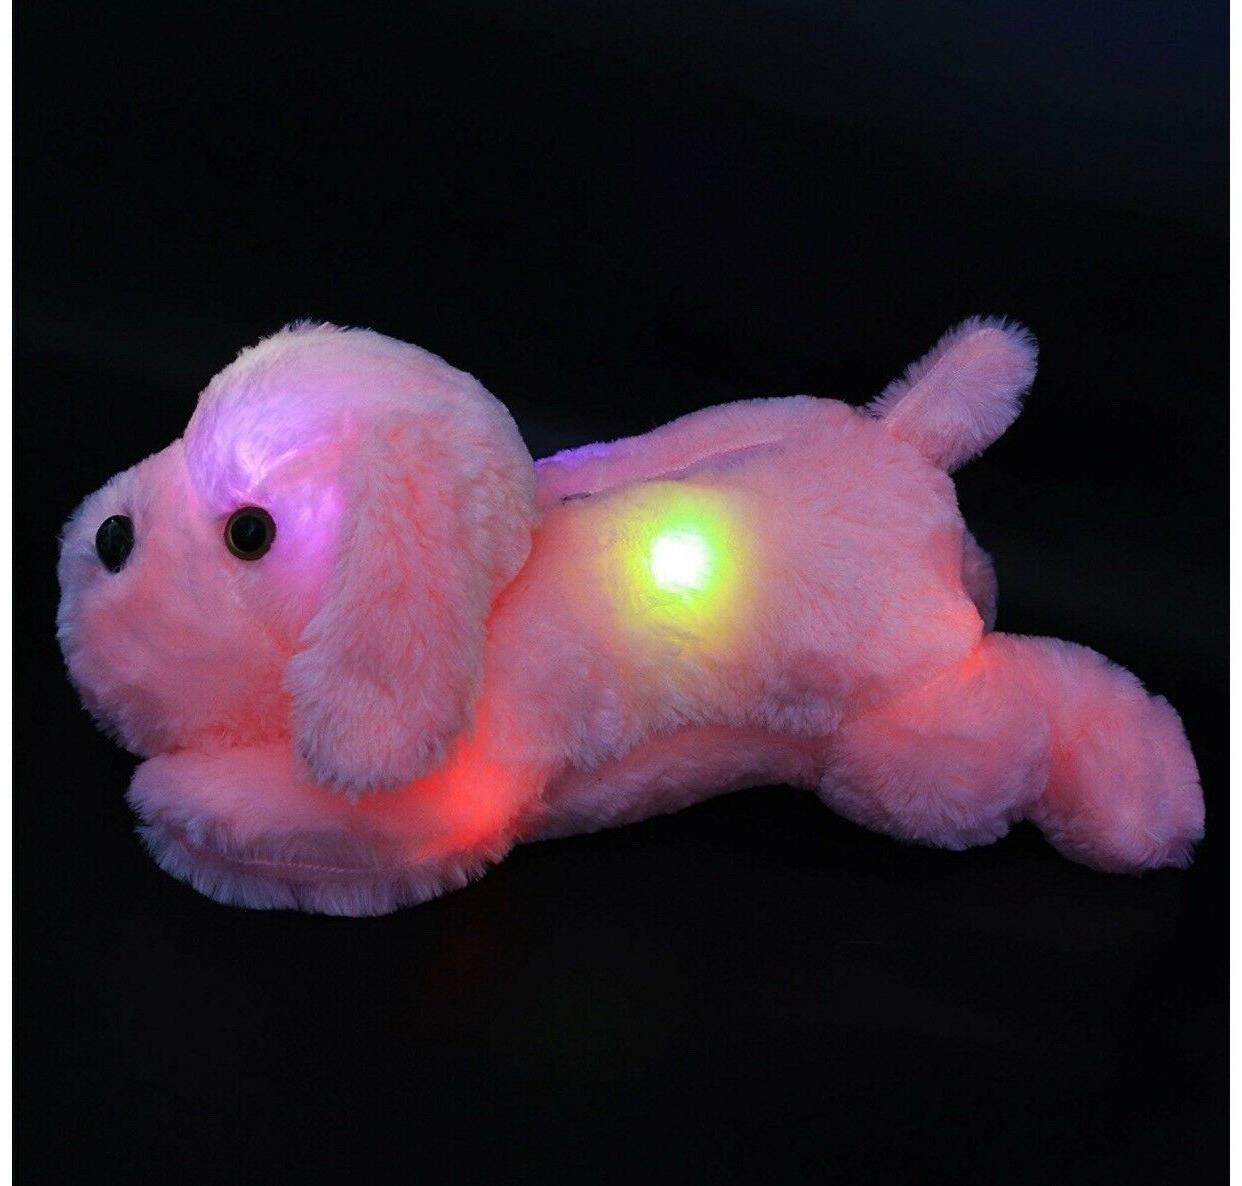 Wewill Night Light LED Stuffed Lovely Dog Glow Plush Toys Gifts